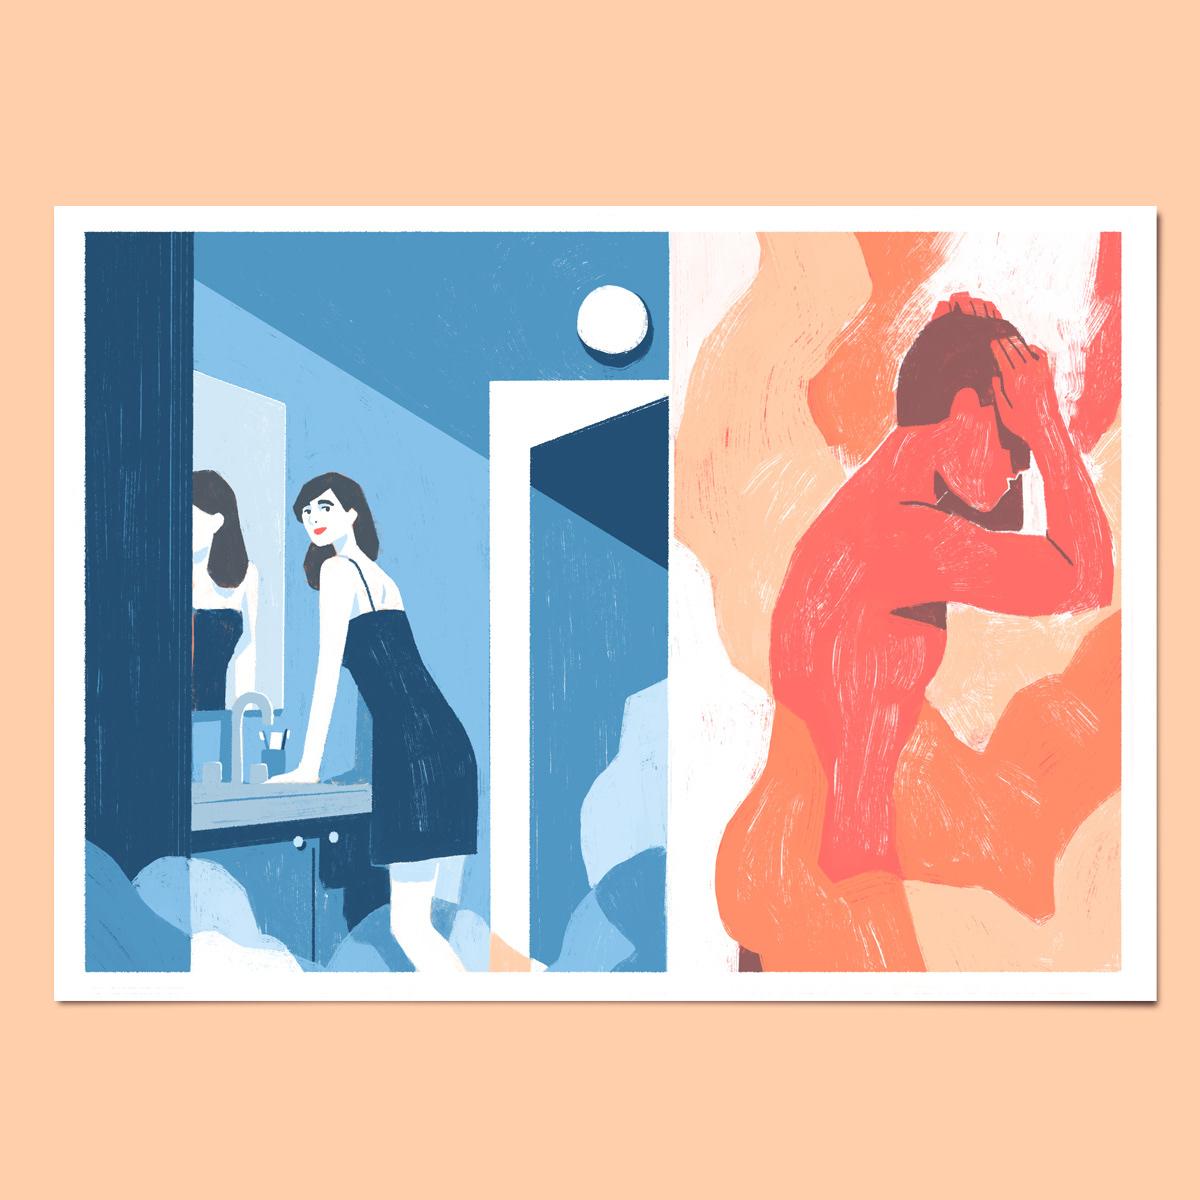 Love couple relation breakfast fight SHOWER le temps kim roselier